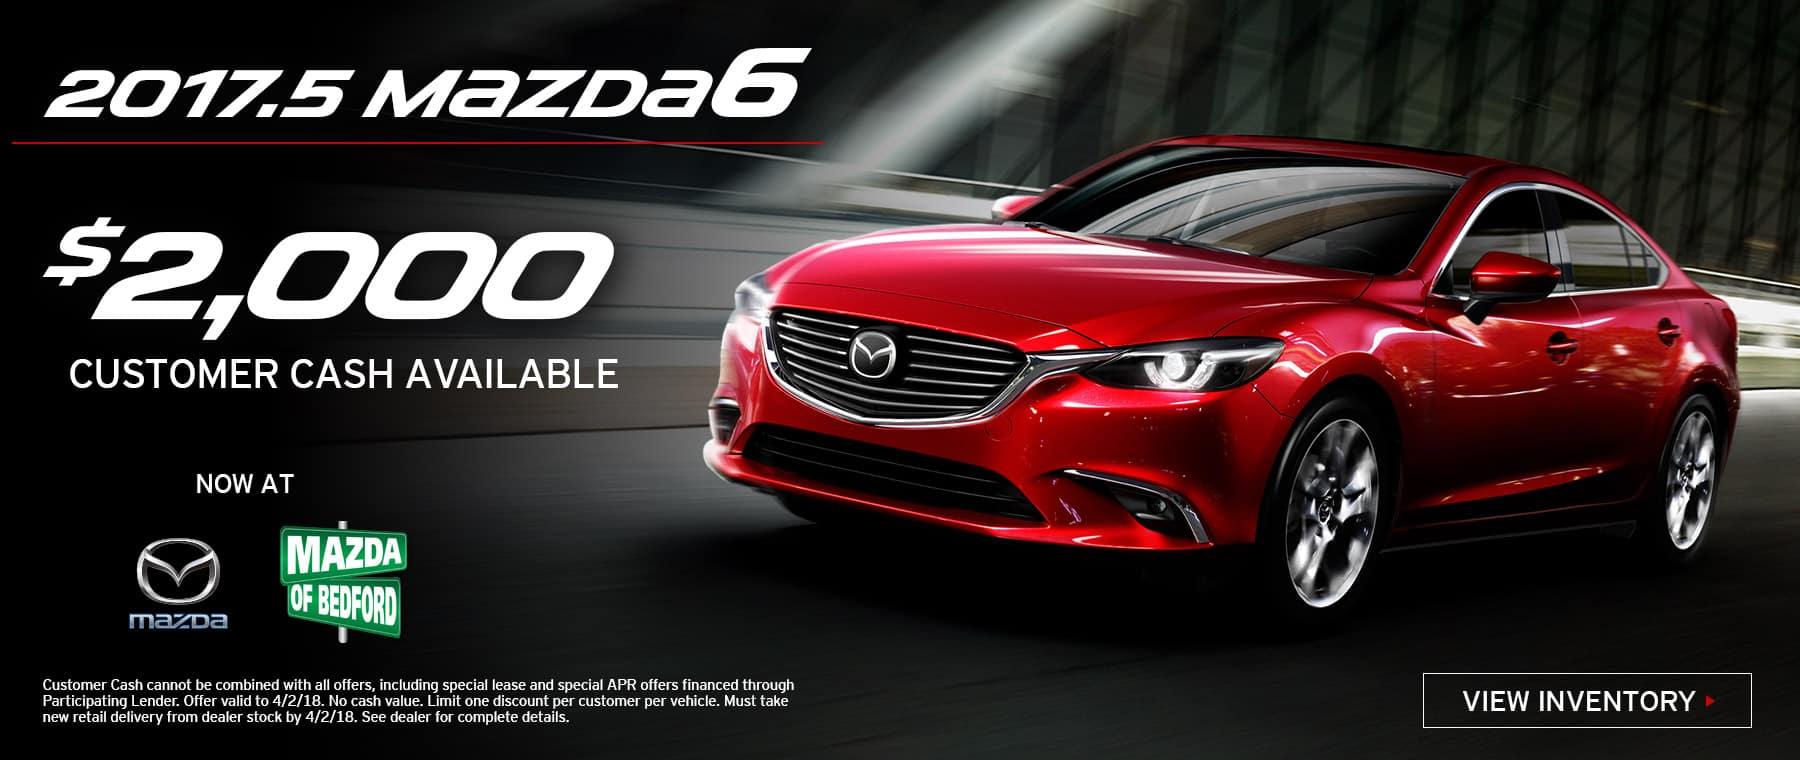 2017.5 Mazda6 Customer Cash